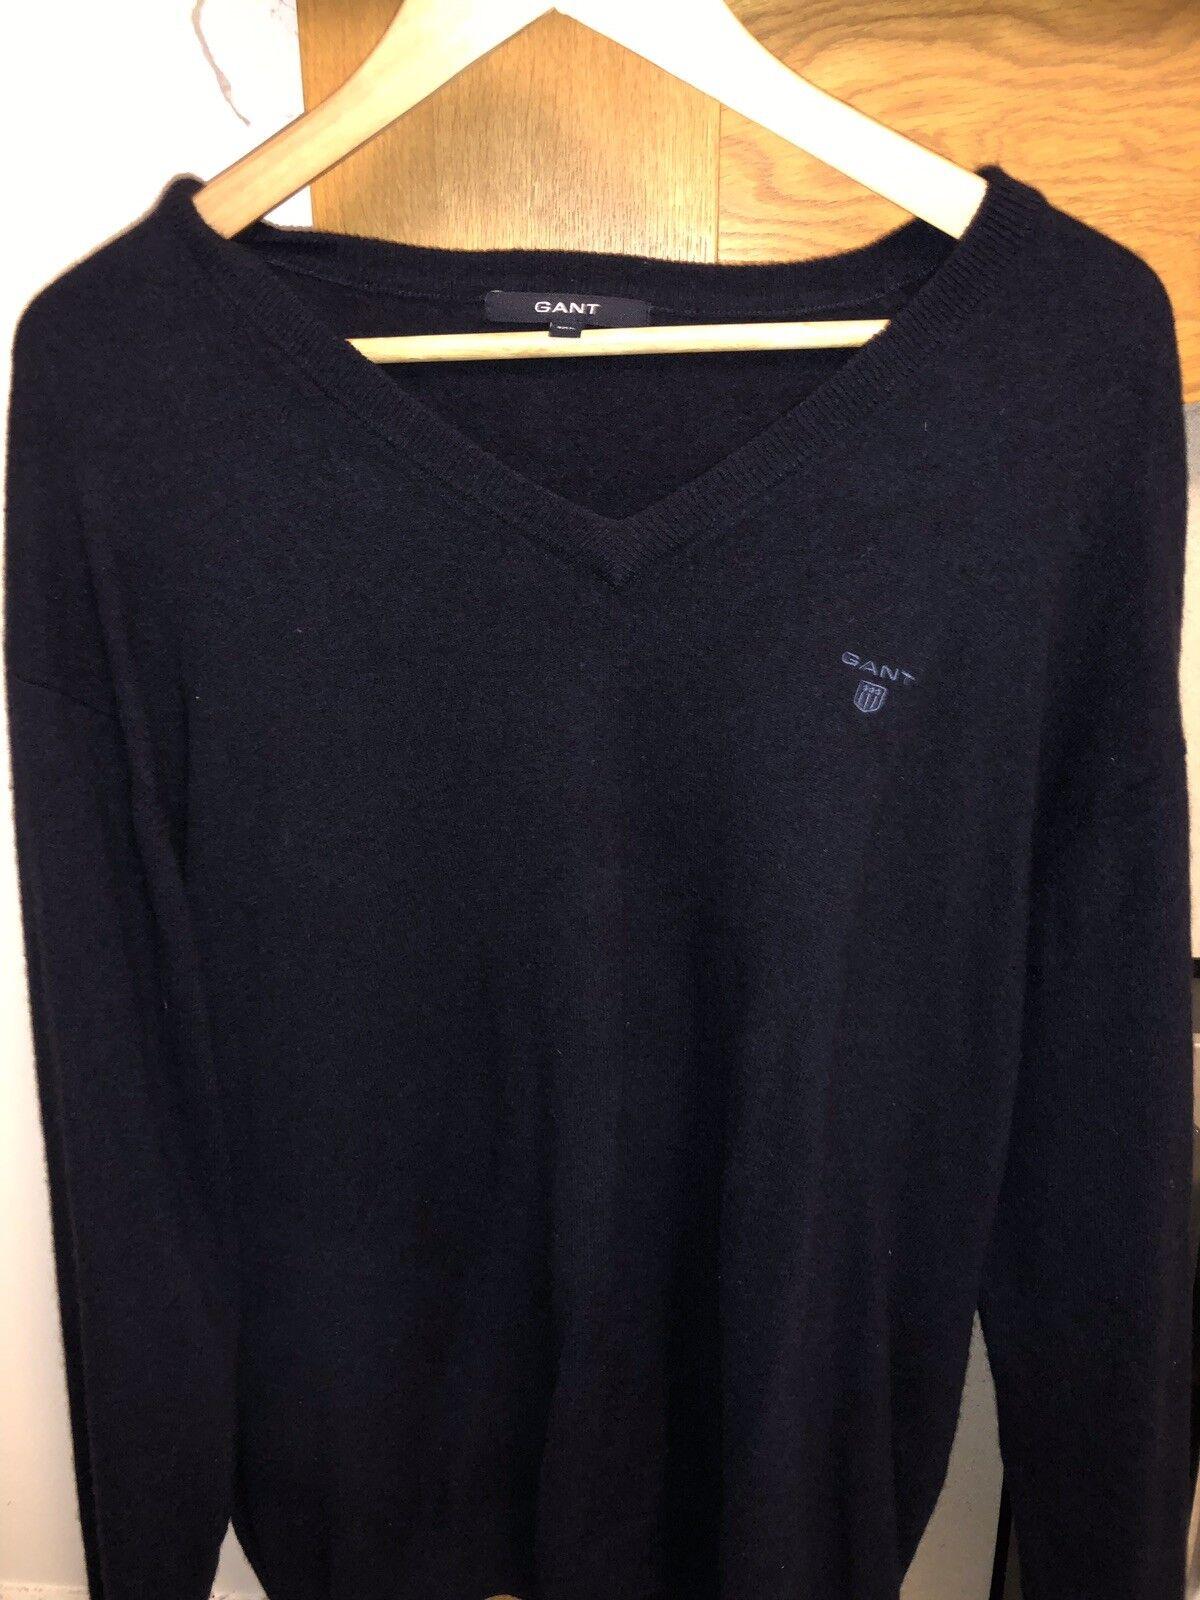 Gant  Herren Jumper Pullover Top Knitwear  ️ Long Sleeve XXXXL